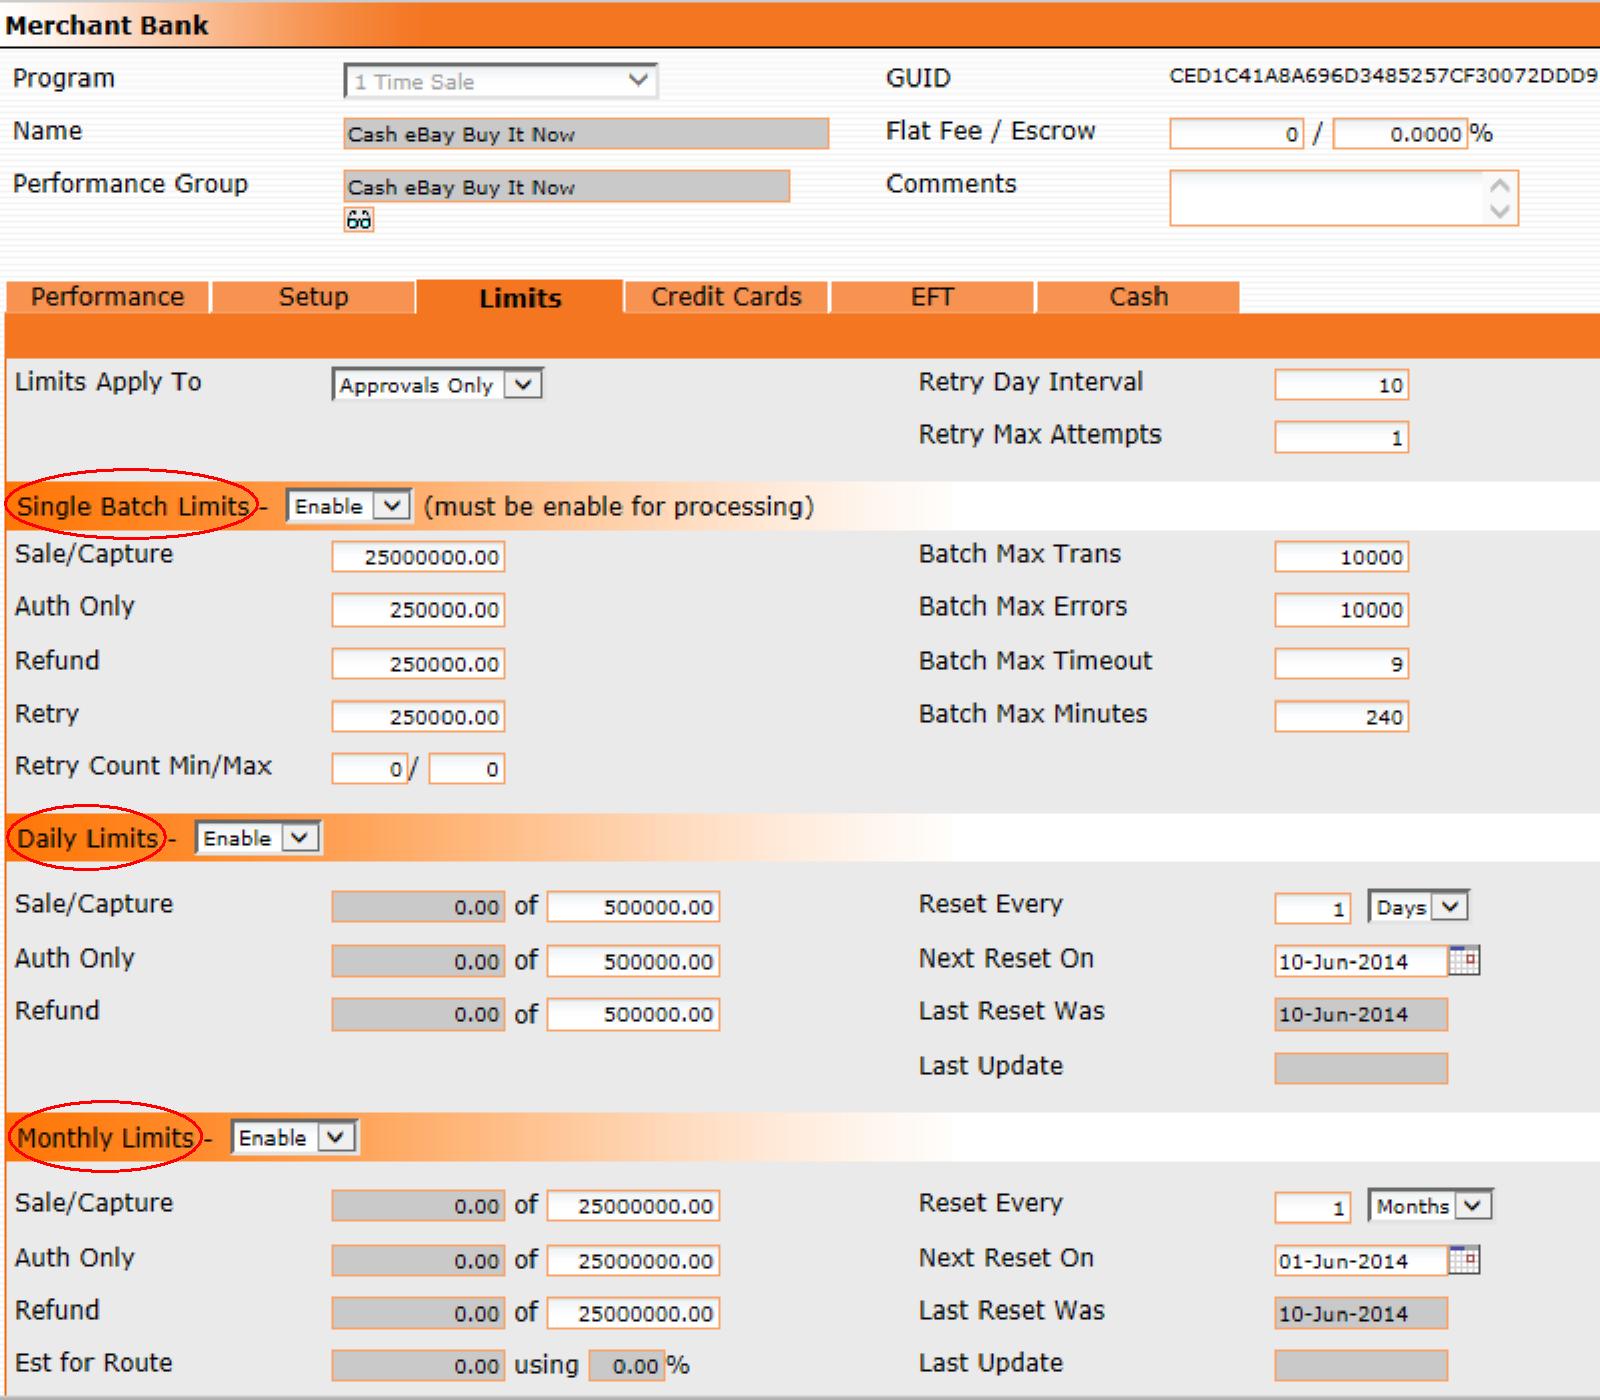 Merchant Bank Limit Options